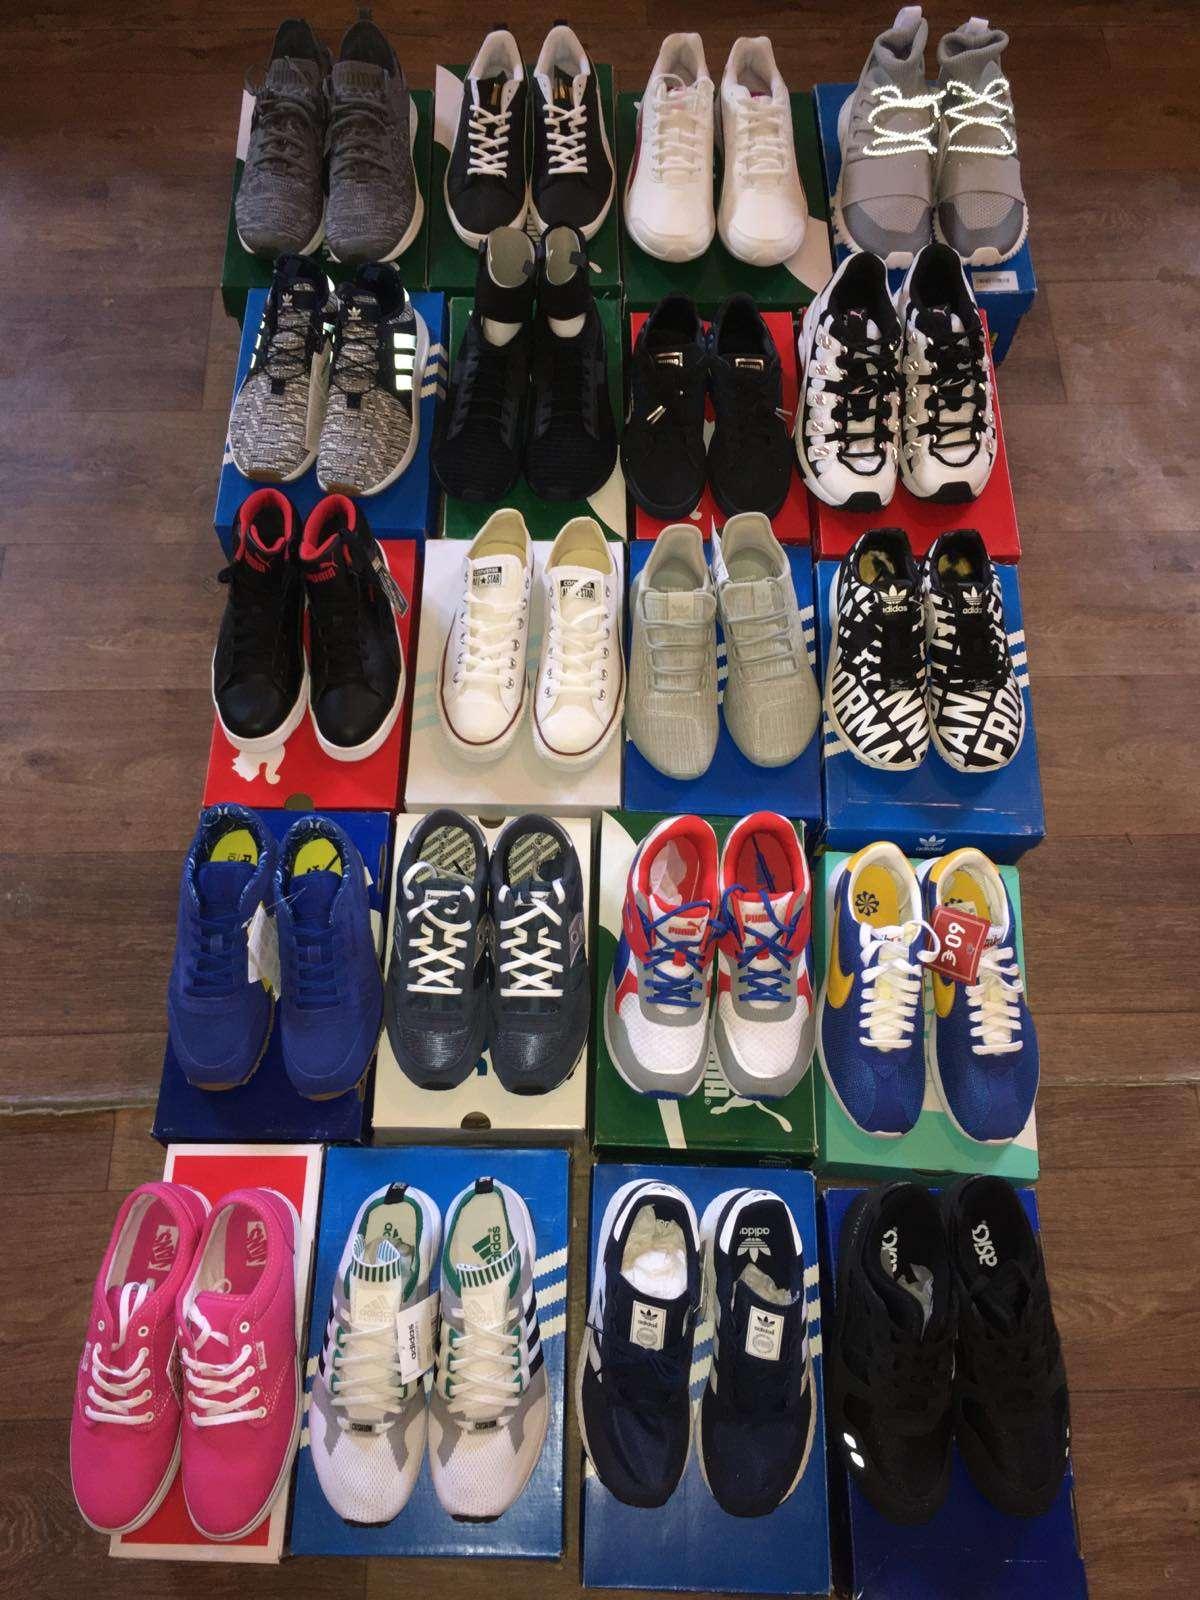 Сток спортивной обуви Nike, Puma, Vans, Adidas, Asics фото 2